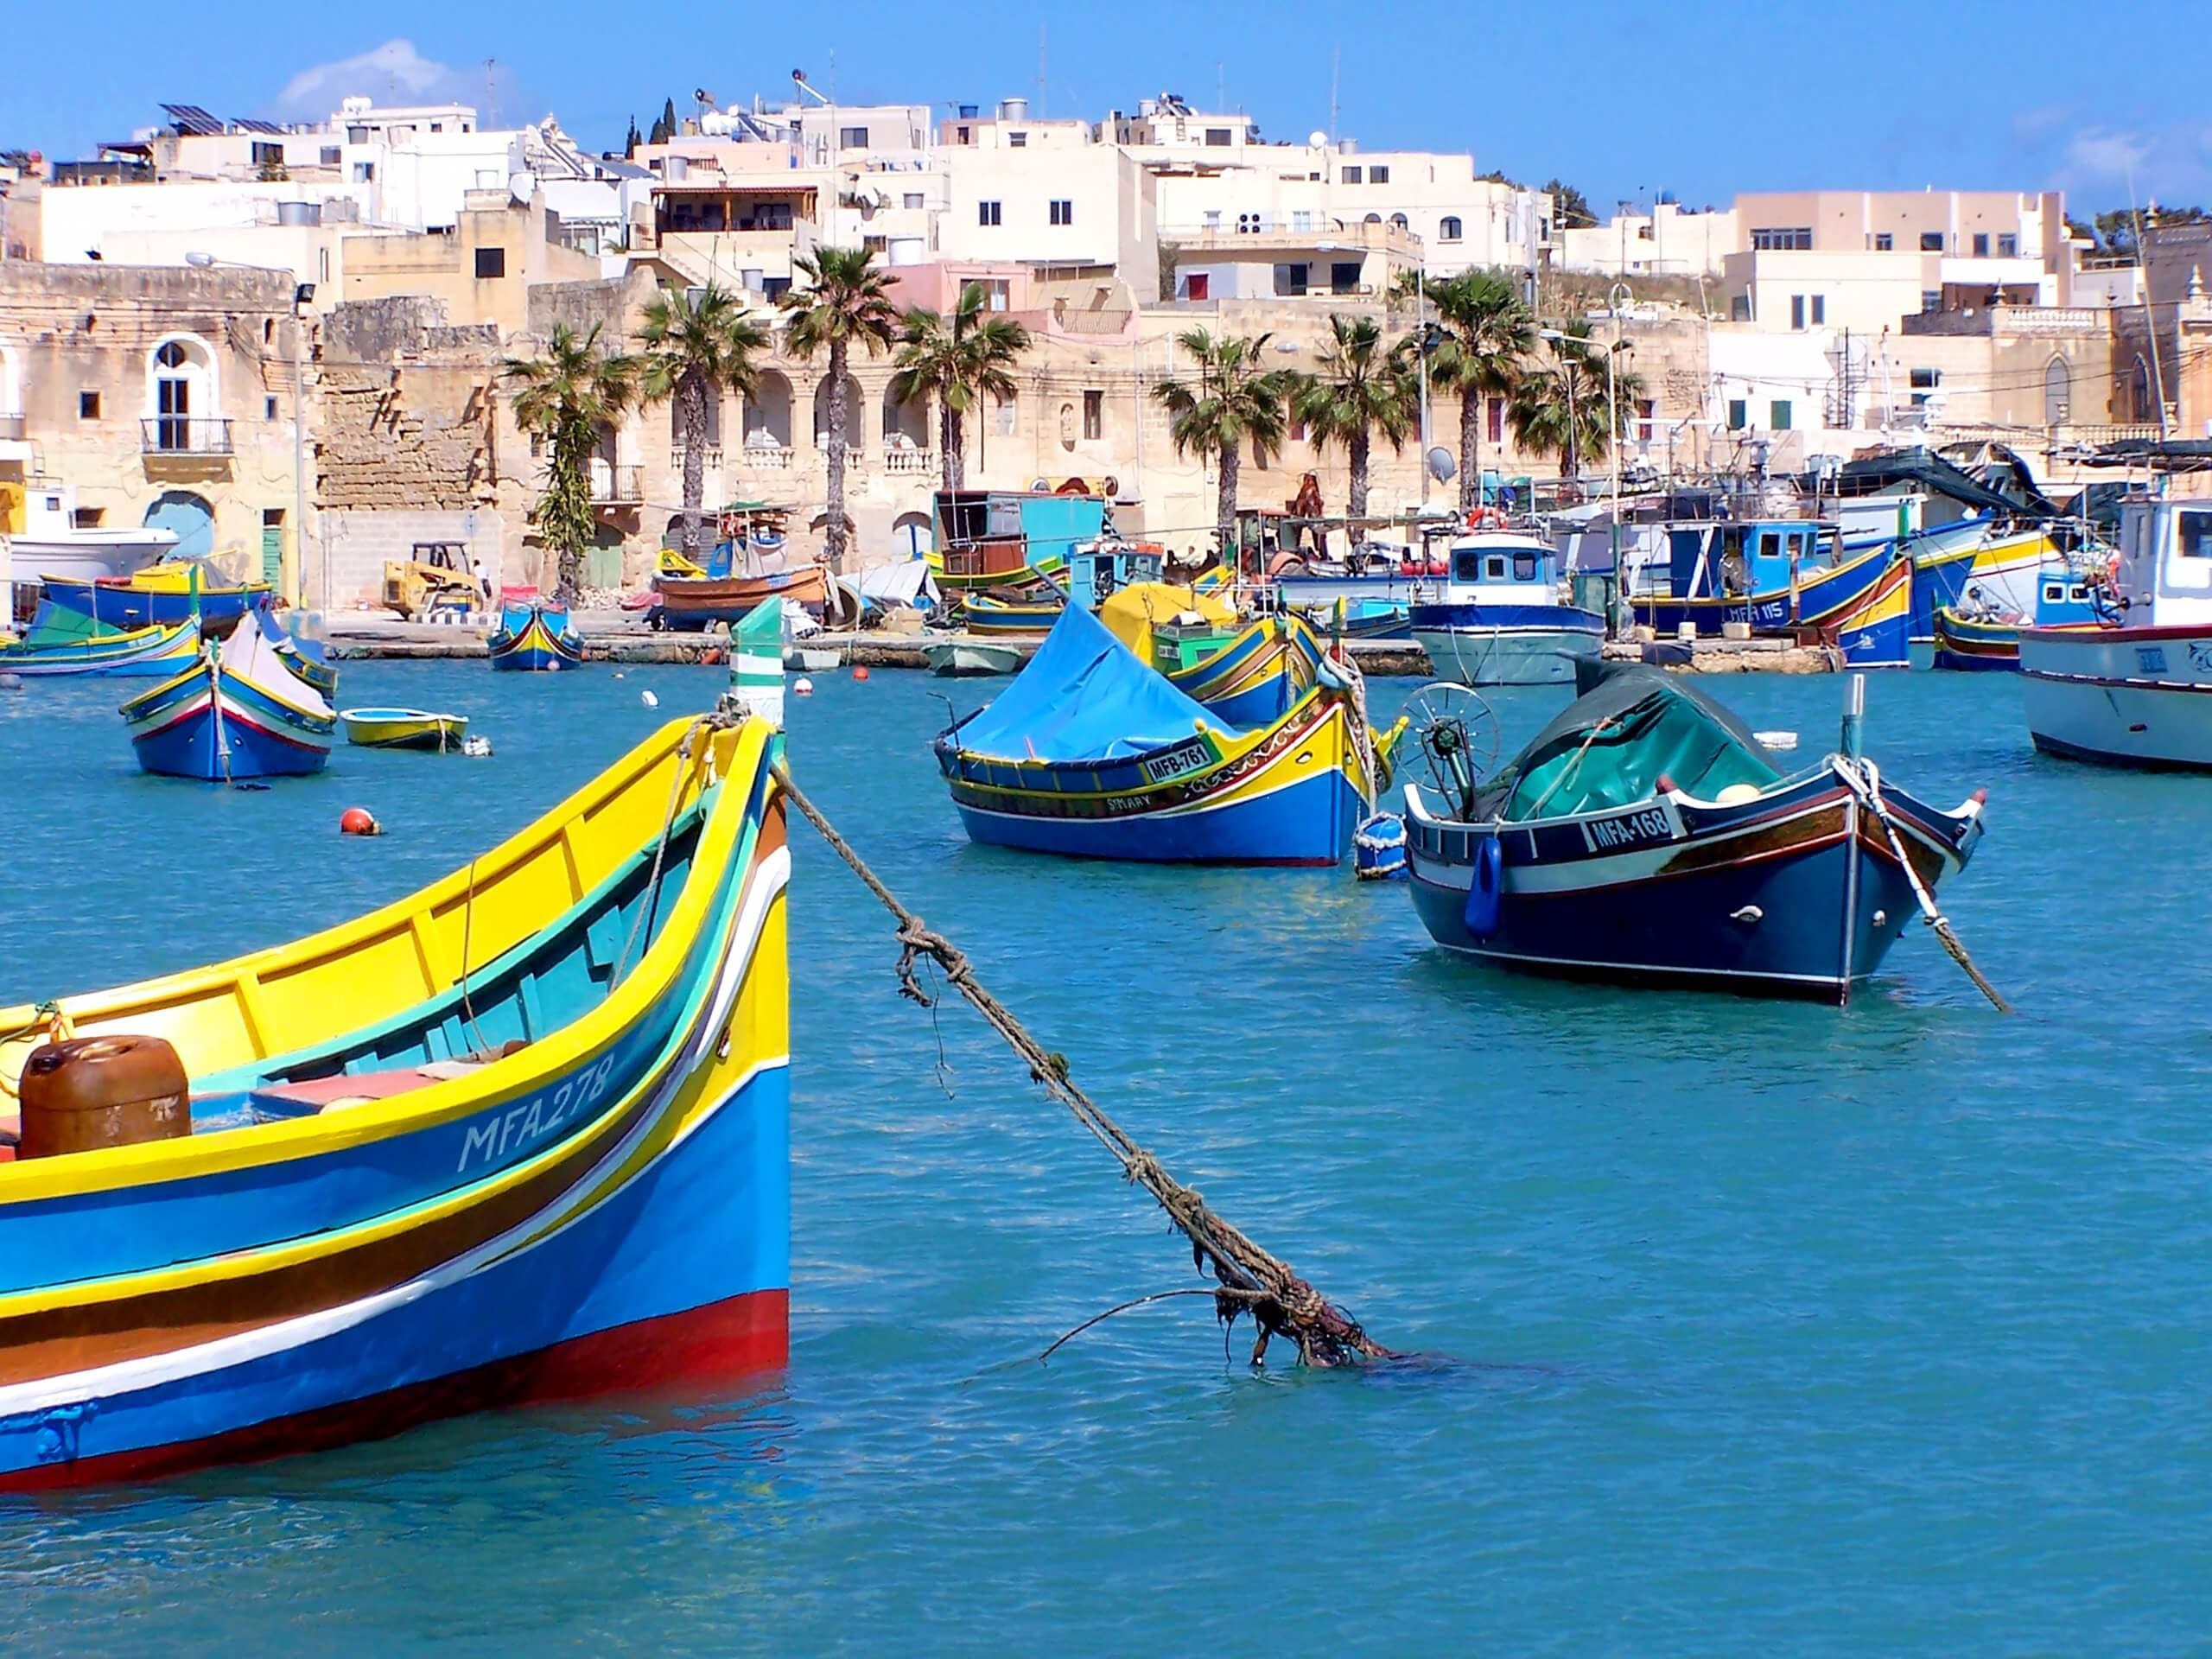 boats-port-sea-stockpack-pixabay